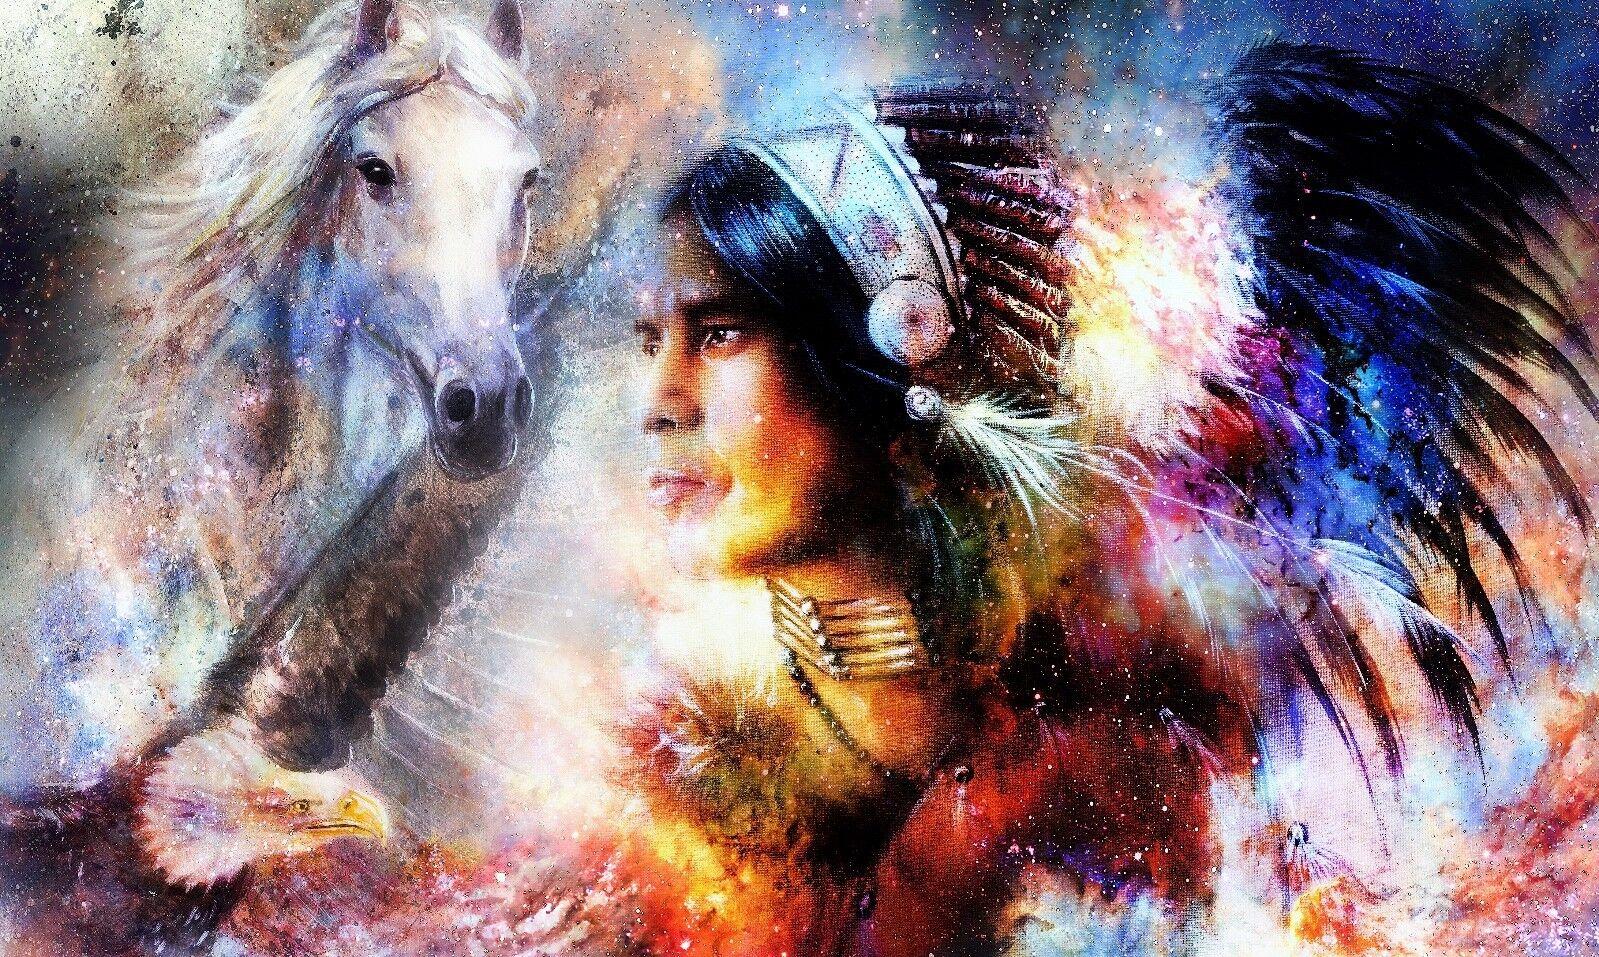 Horse, indian,abstract, american, Kunstwork quality Canvas Drucken choose your Größe